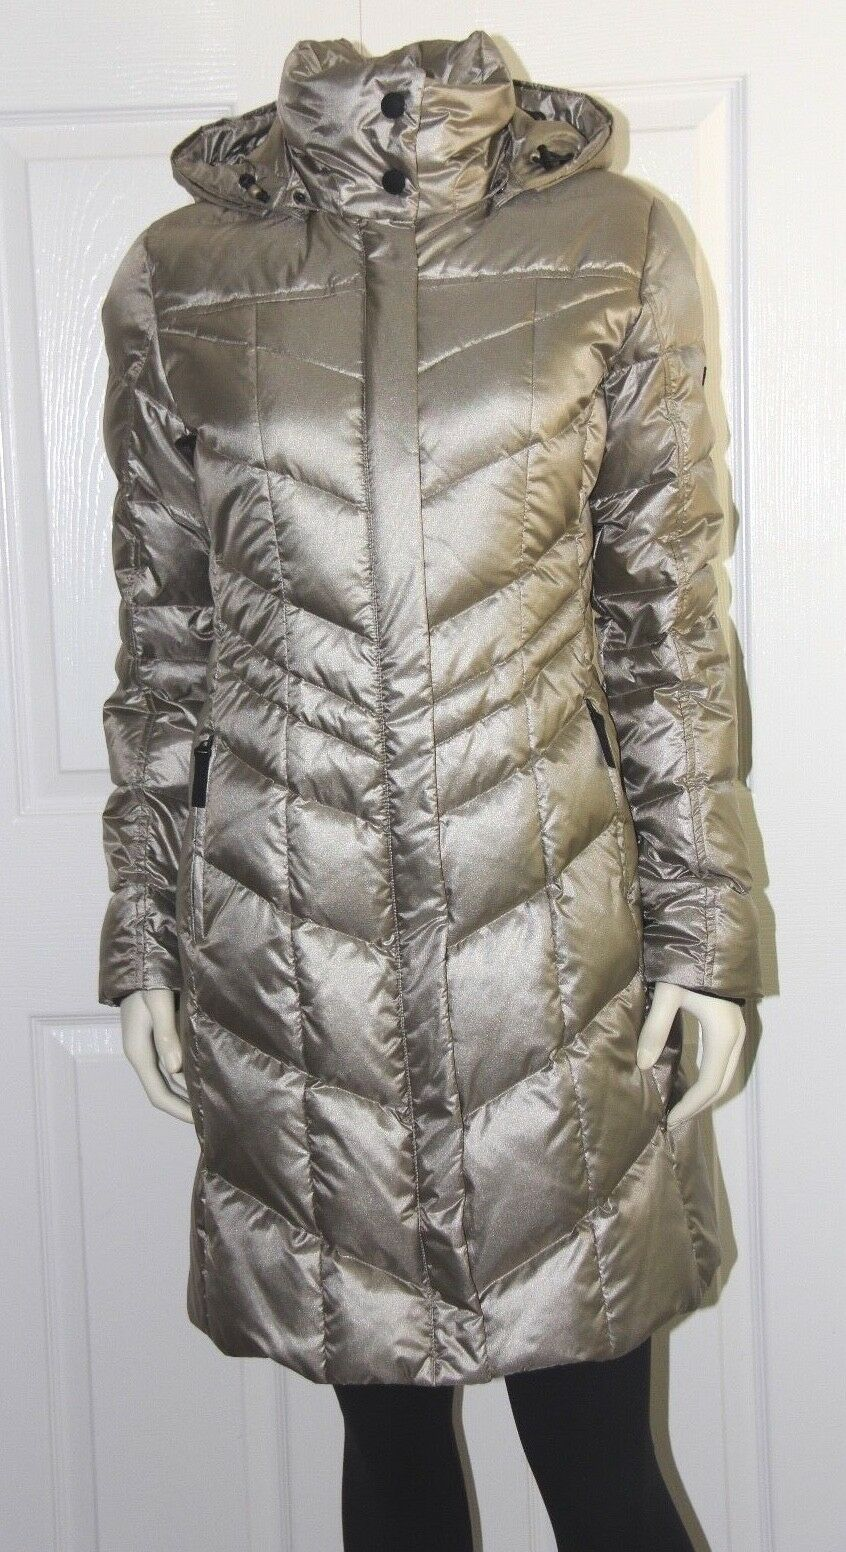 Bogner Fire + Ice Dalia-D Down Coat - Women's Size US 4 XS - gold - NEW